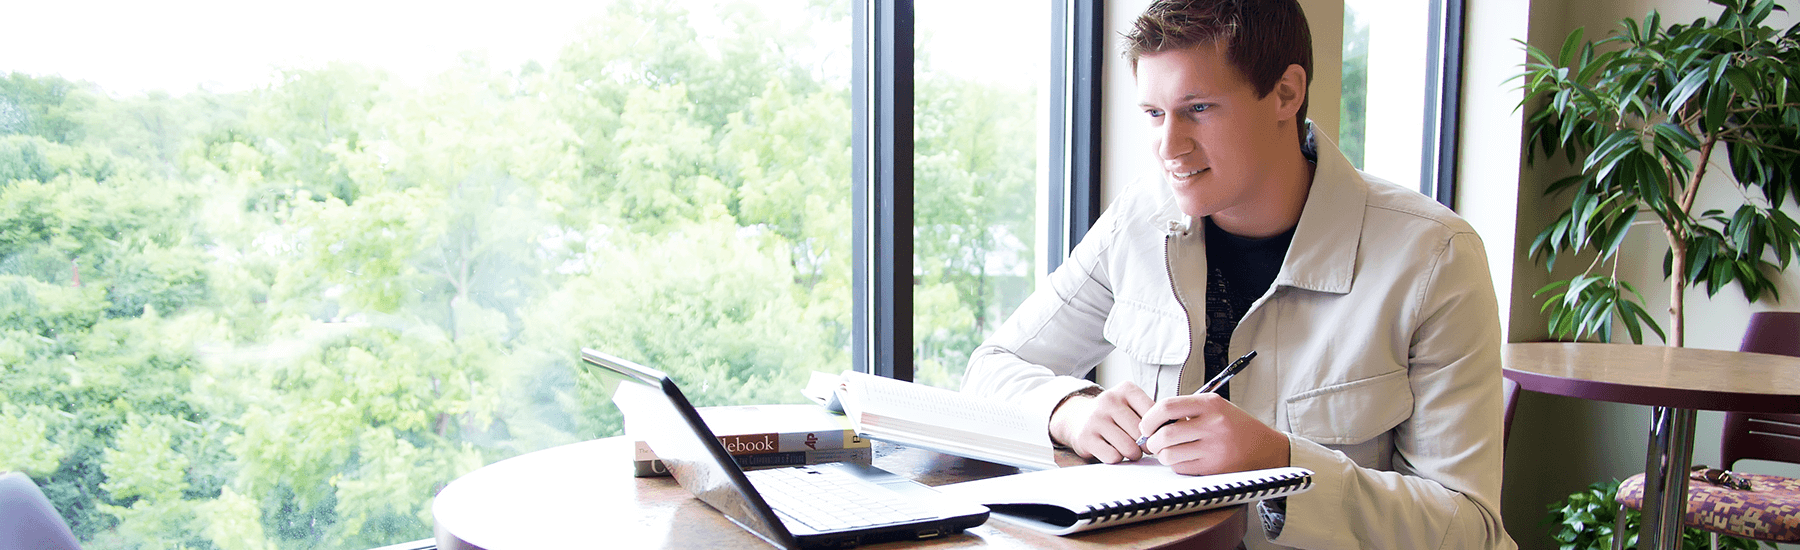 Online Writing Tutoring from Smarthinking